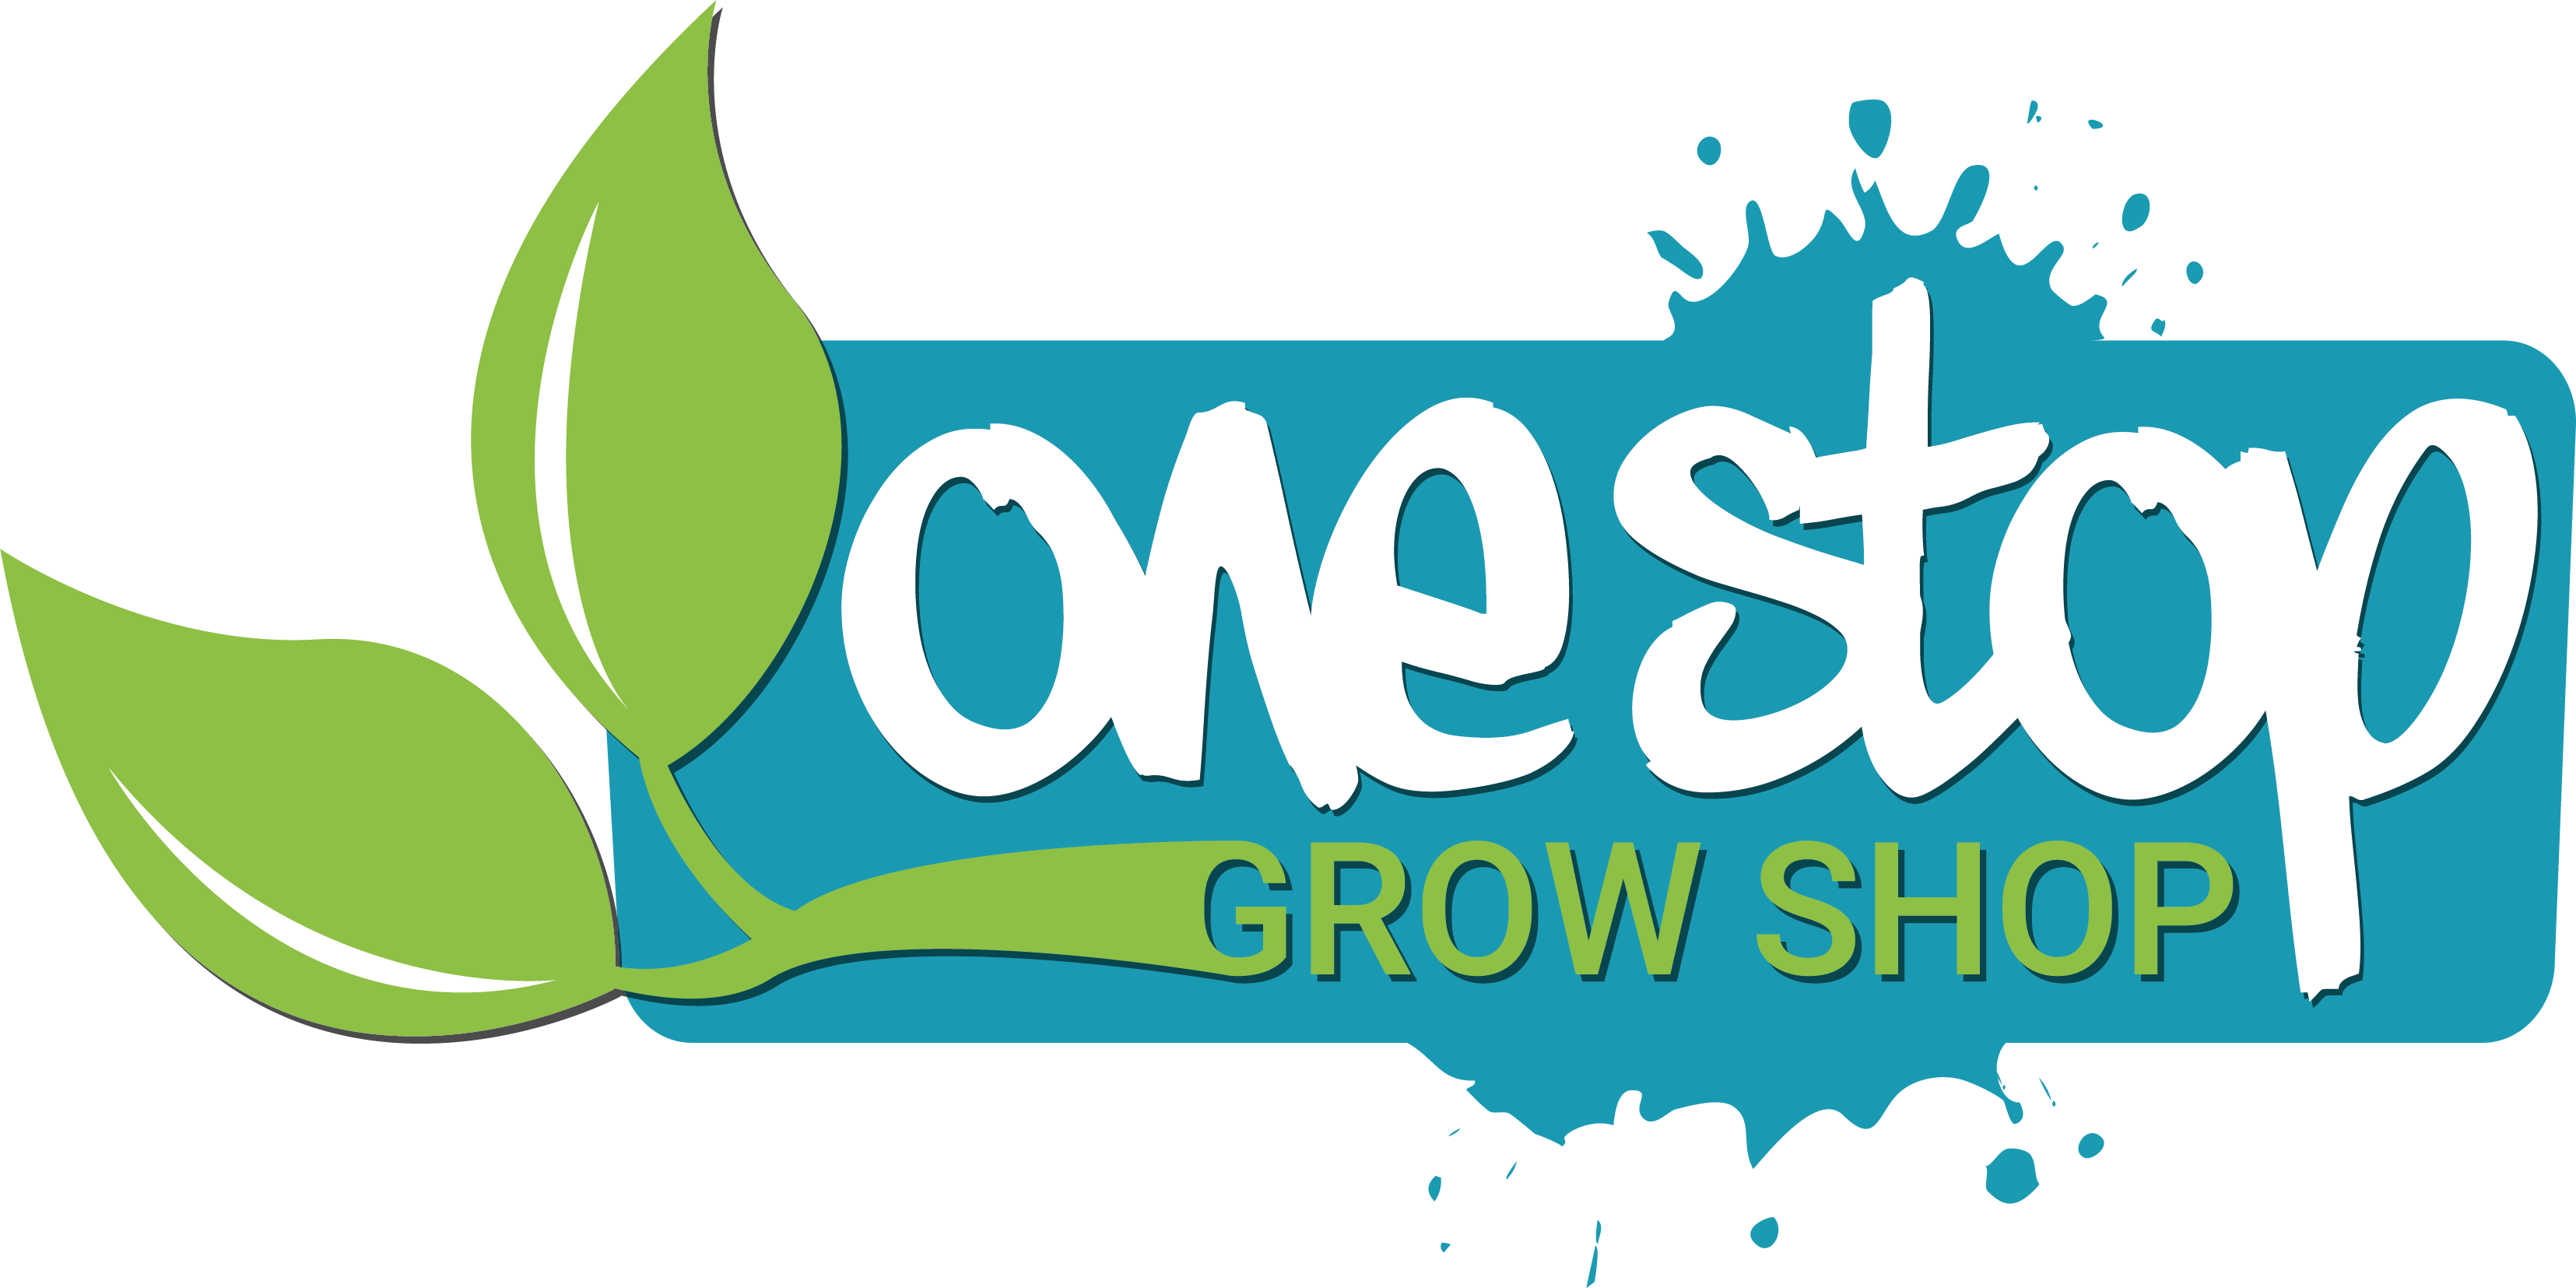 One Stop Grow Shop Hydroponics Store Grow Lights Tents Kits and More - One Stop Grow Shop Hydroponics  sc 1 th 159 & One Stop Grow Shop Hydroponics Store: Grow Lights Tents Kits and ...